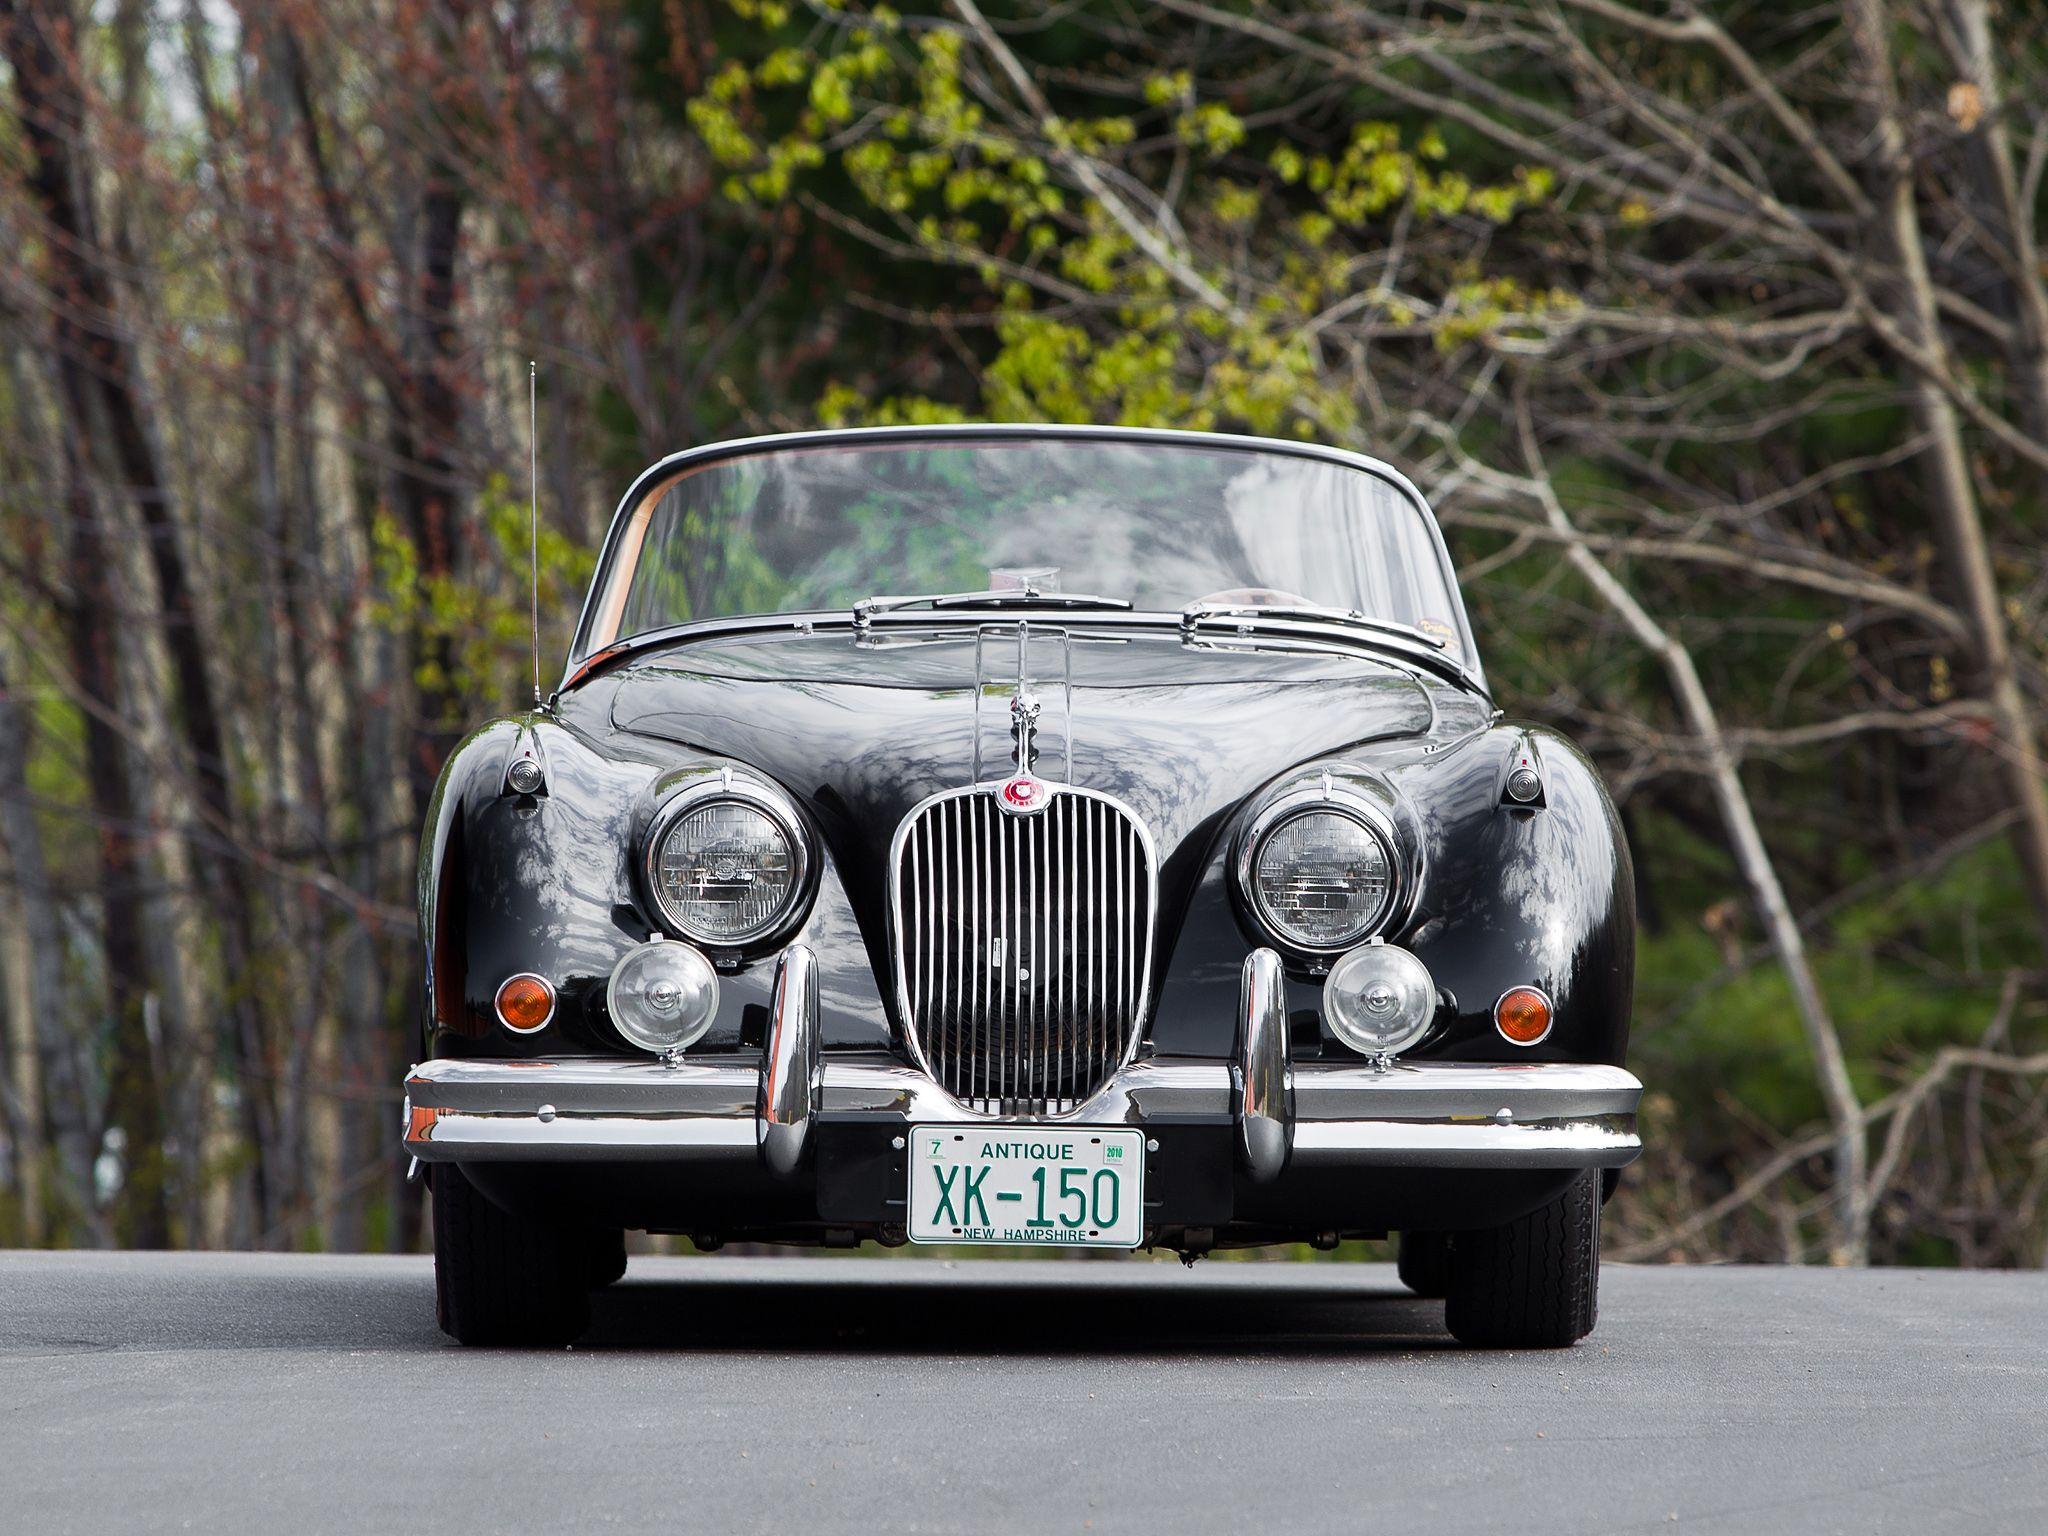 Clic Cars Vintage